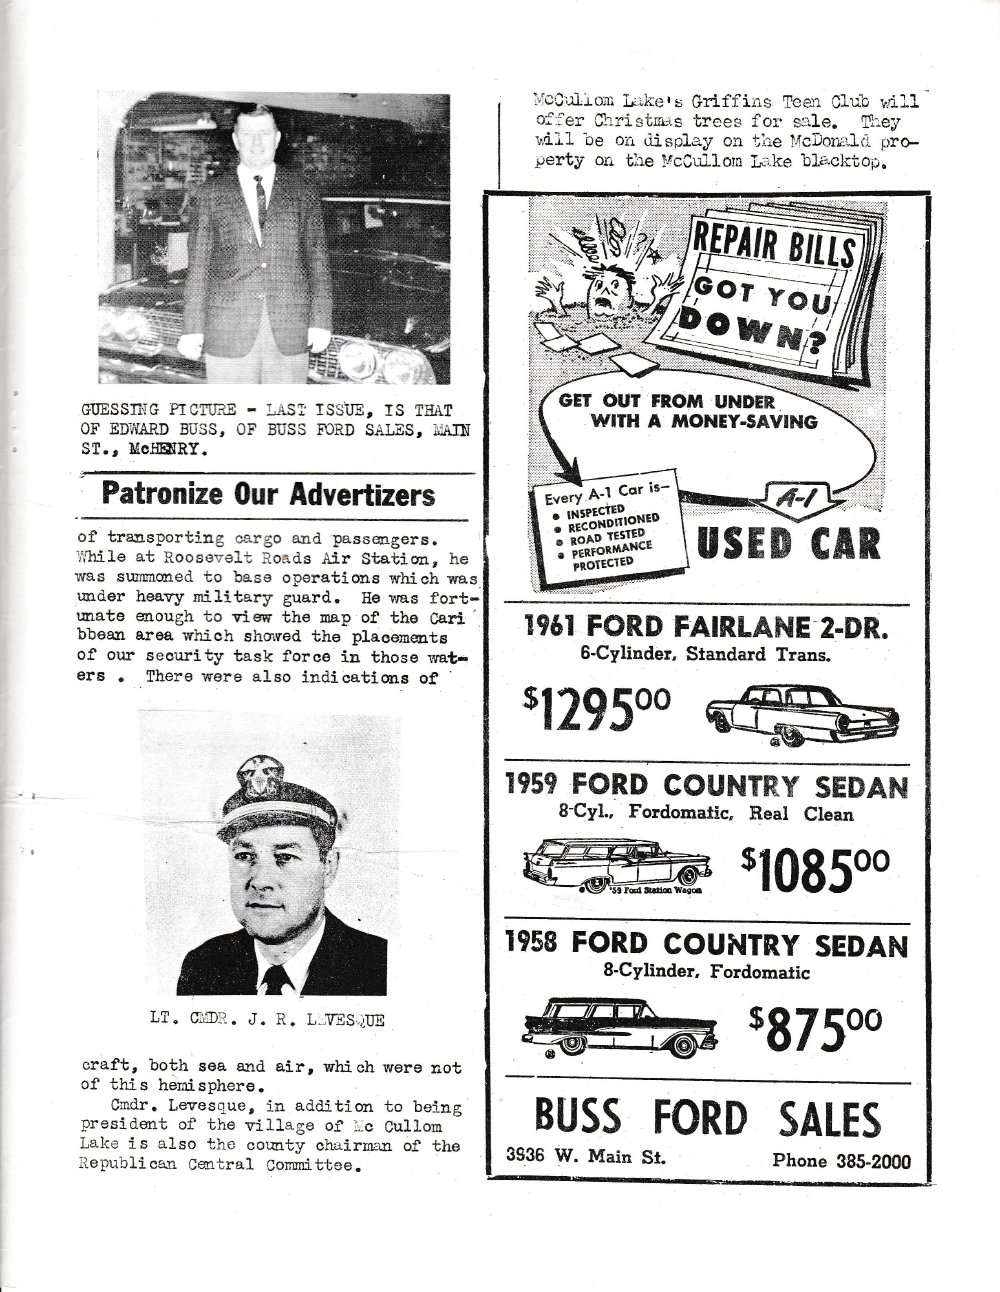 The Pictorial Newsletter: December 5, 1962